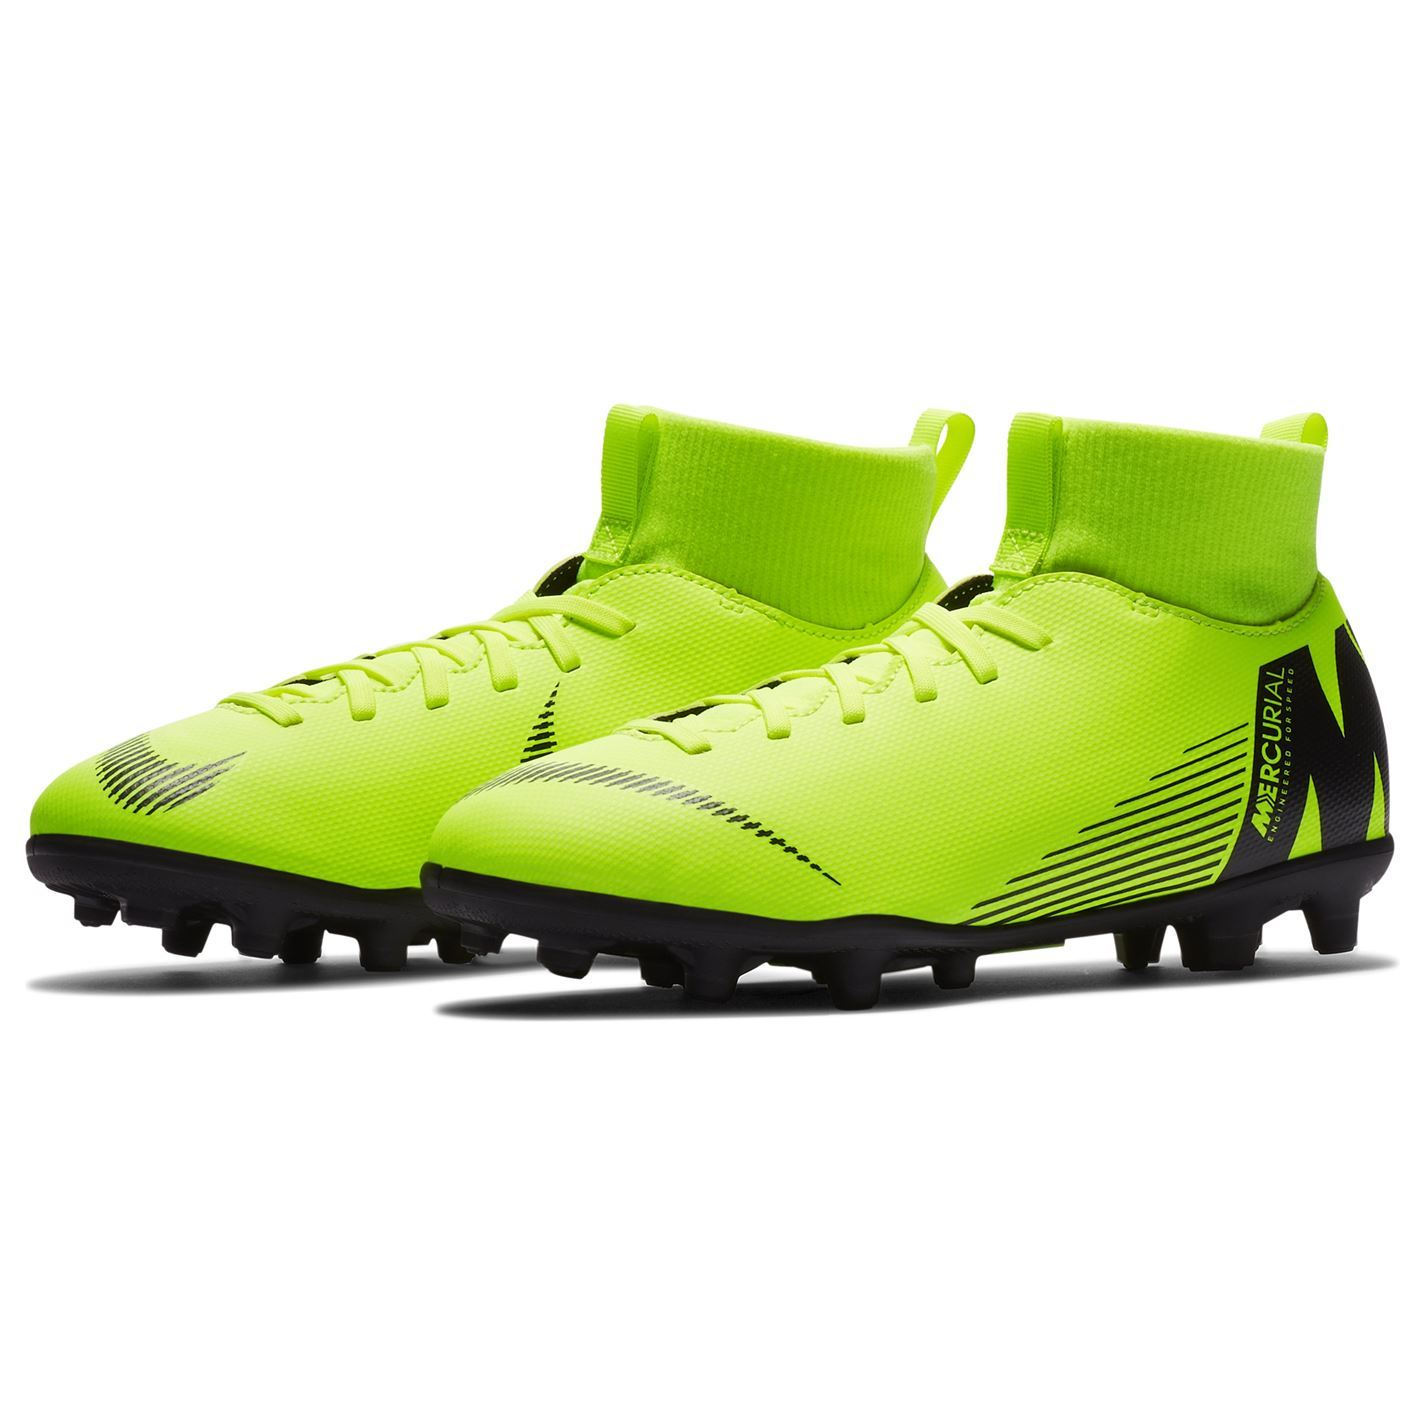 Nike-MERCURIAL-SUPERFLY-Club-DF-TERRA-FERMA-SCARPE-DA-CALCIO-JUNIOR-CALCIO-Cunei miniatura 16